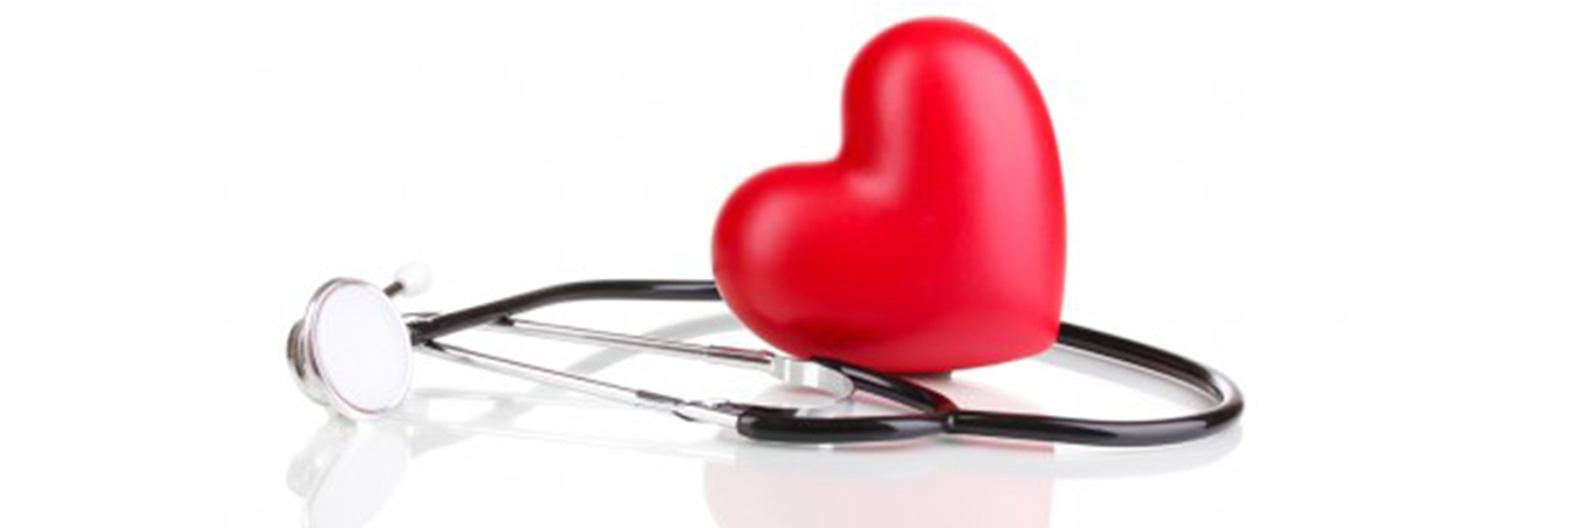 hipertenzija kaip parašyti diagnozę